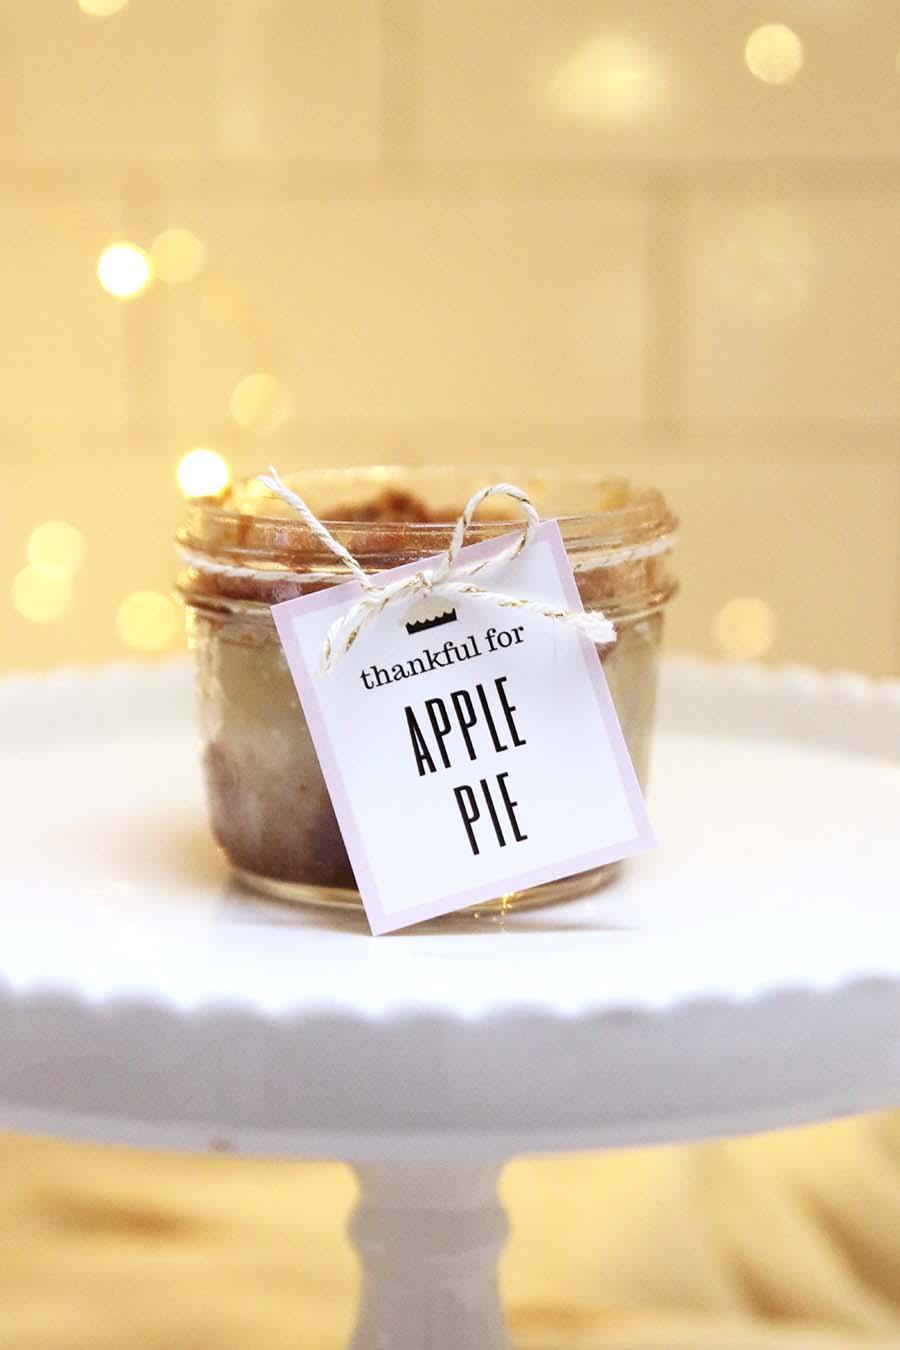 free apple pie printable for Thanksgiving